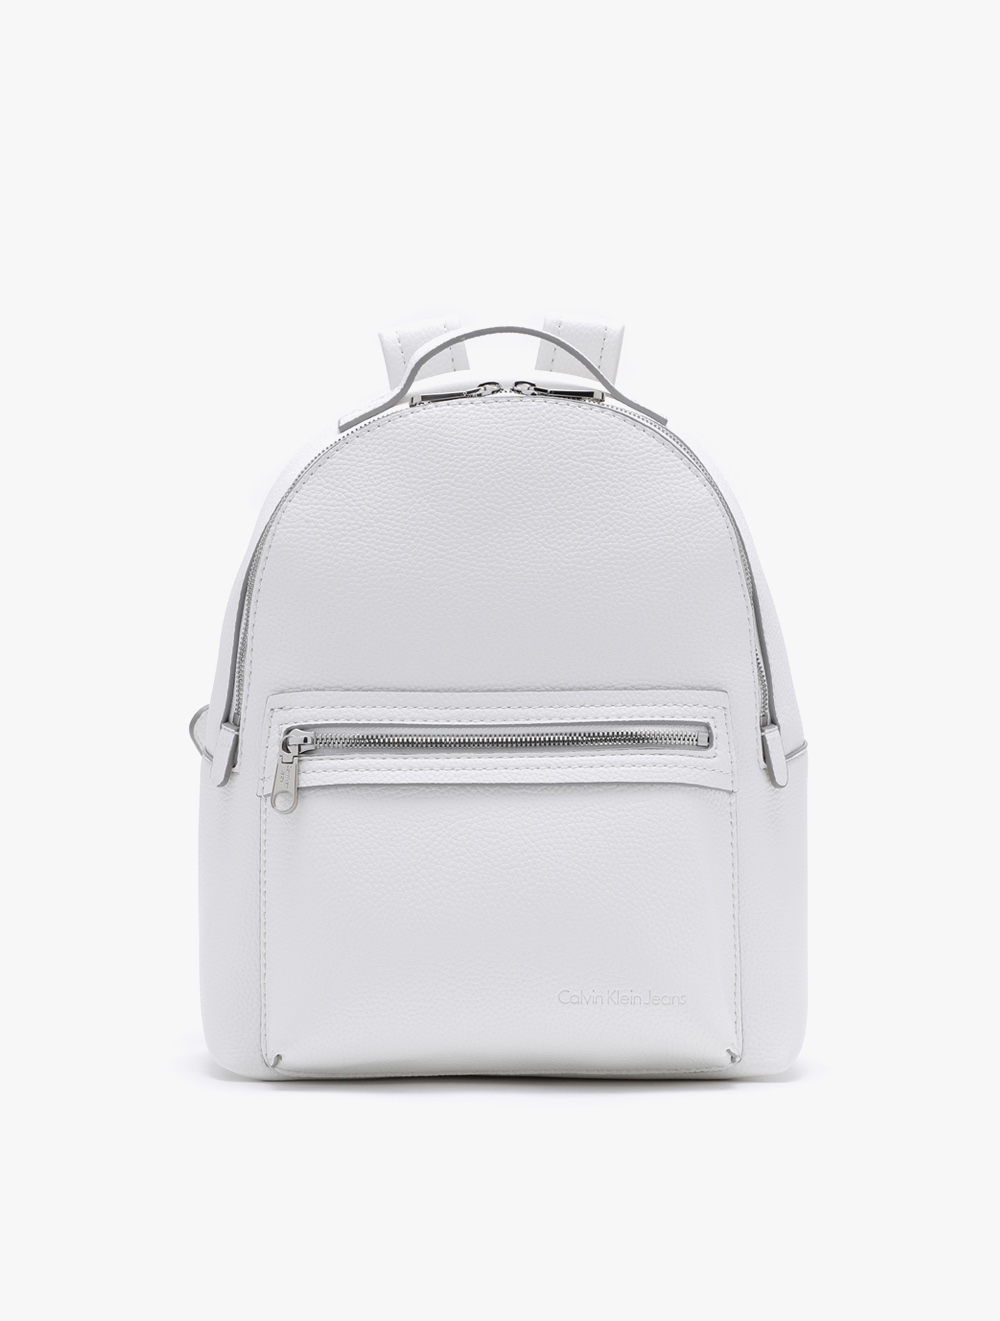 Online Shopping International Lifestyle Branded Product Tas Wanita Hand Bag Ssf0686 Buy Now